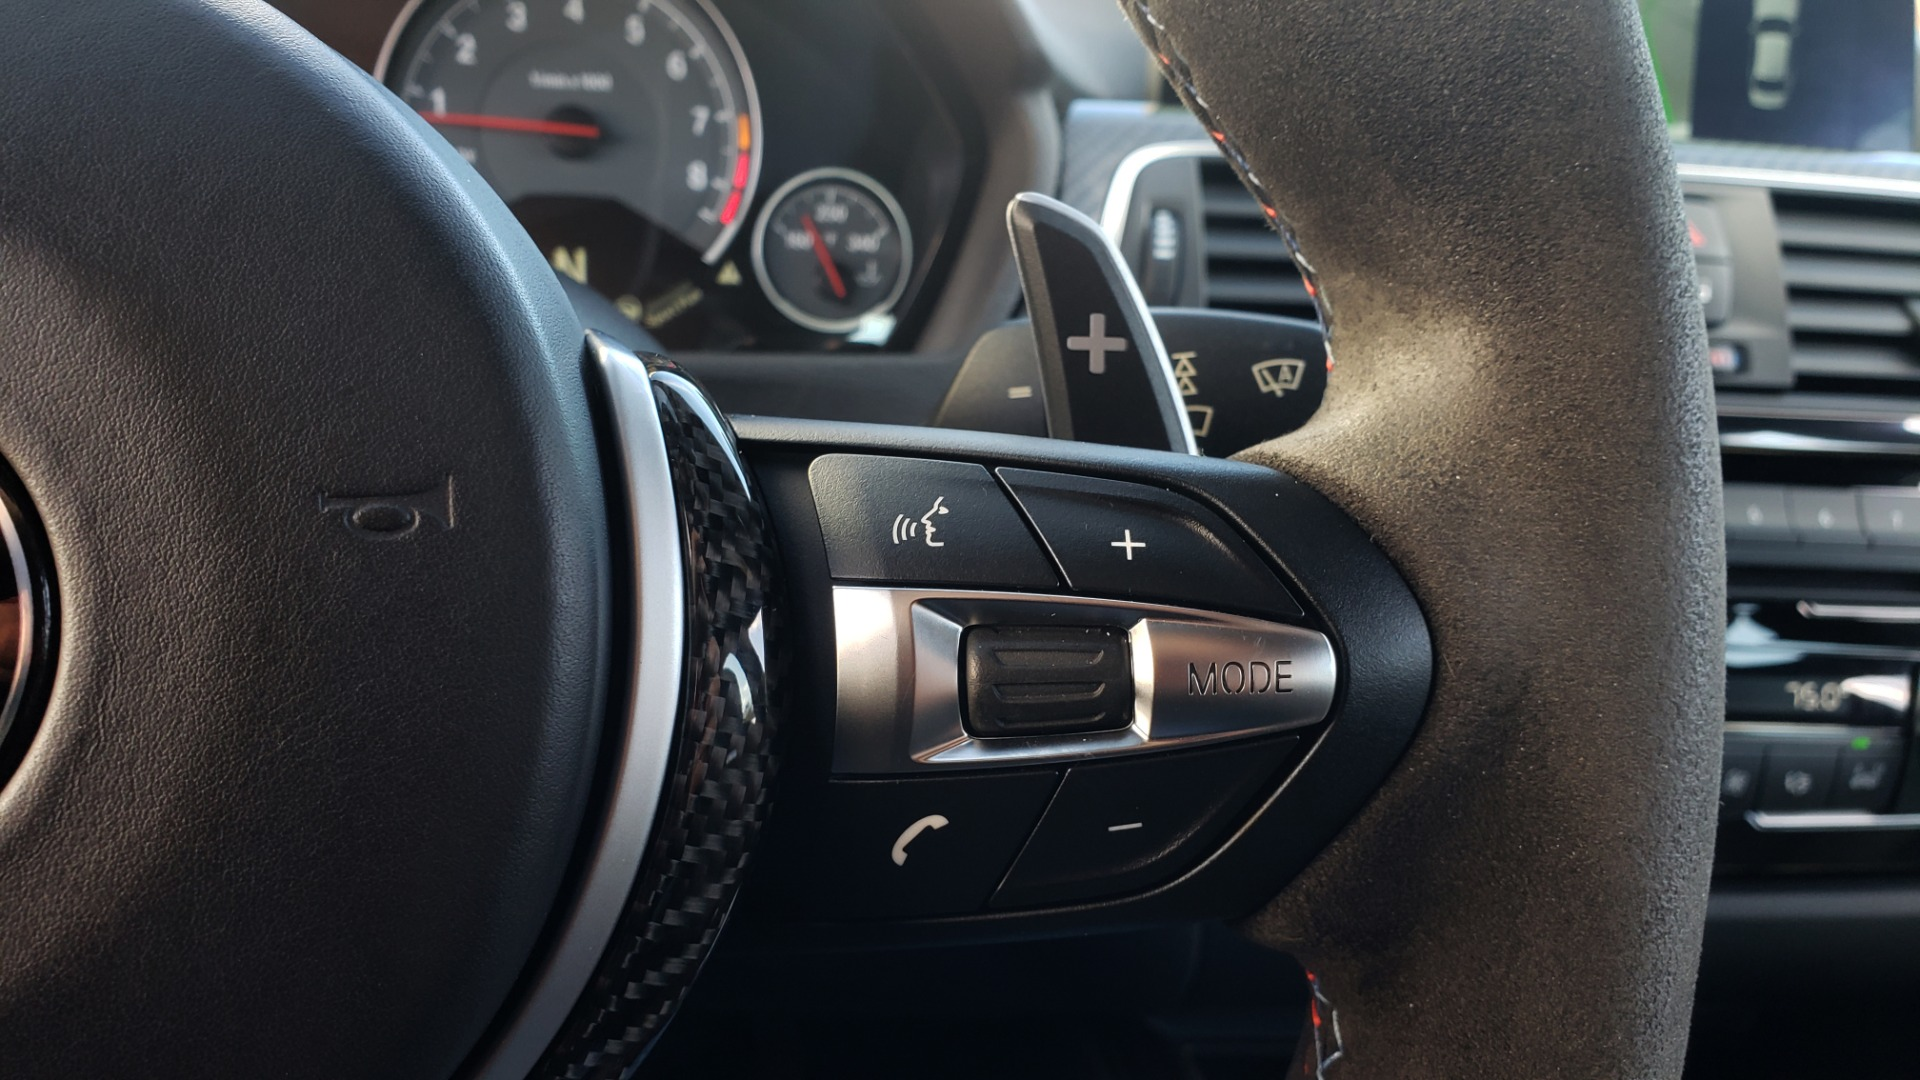 Used 2016 BMW M3 SEDAN / EXECUTIVE PKG / M-SUSPENSION / HARMAN/KARDON SOUND for sale Sold at Formula Imports in Charlotte NC 28227 50